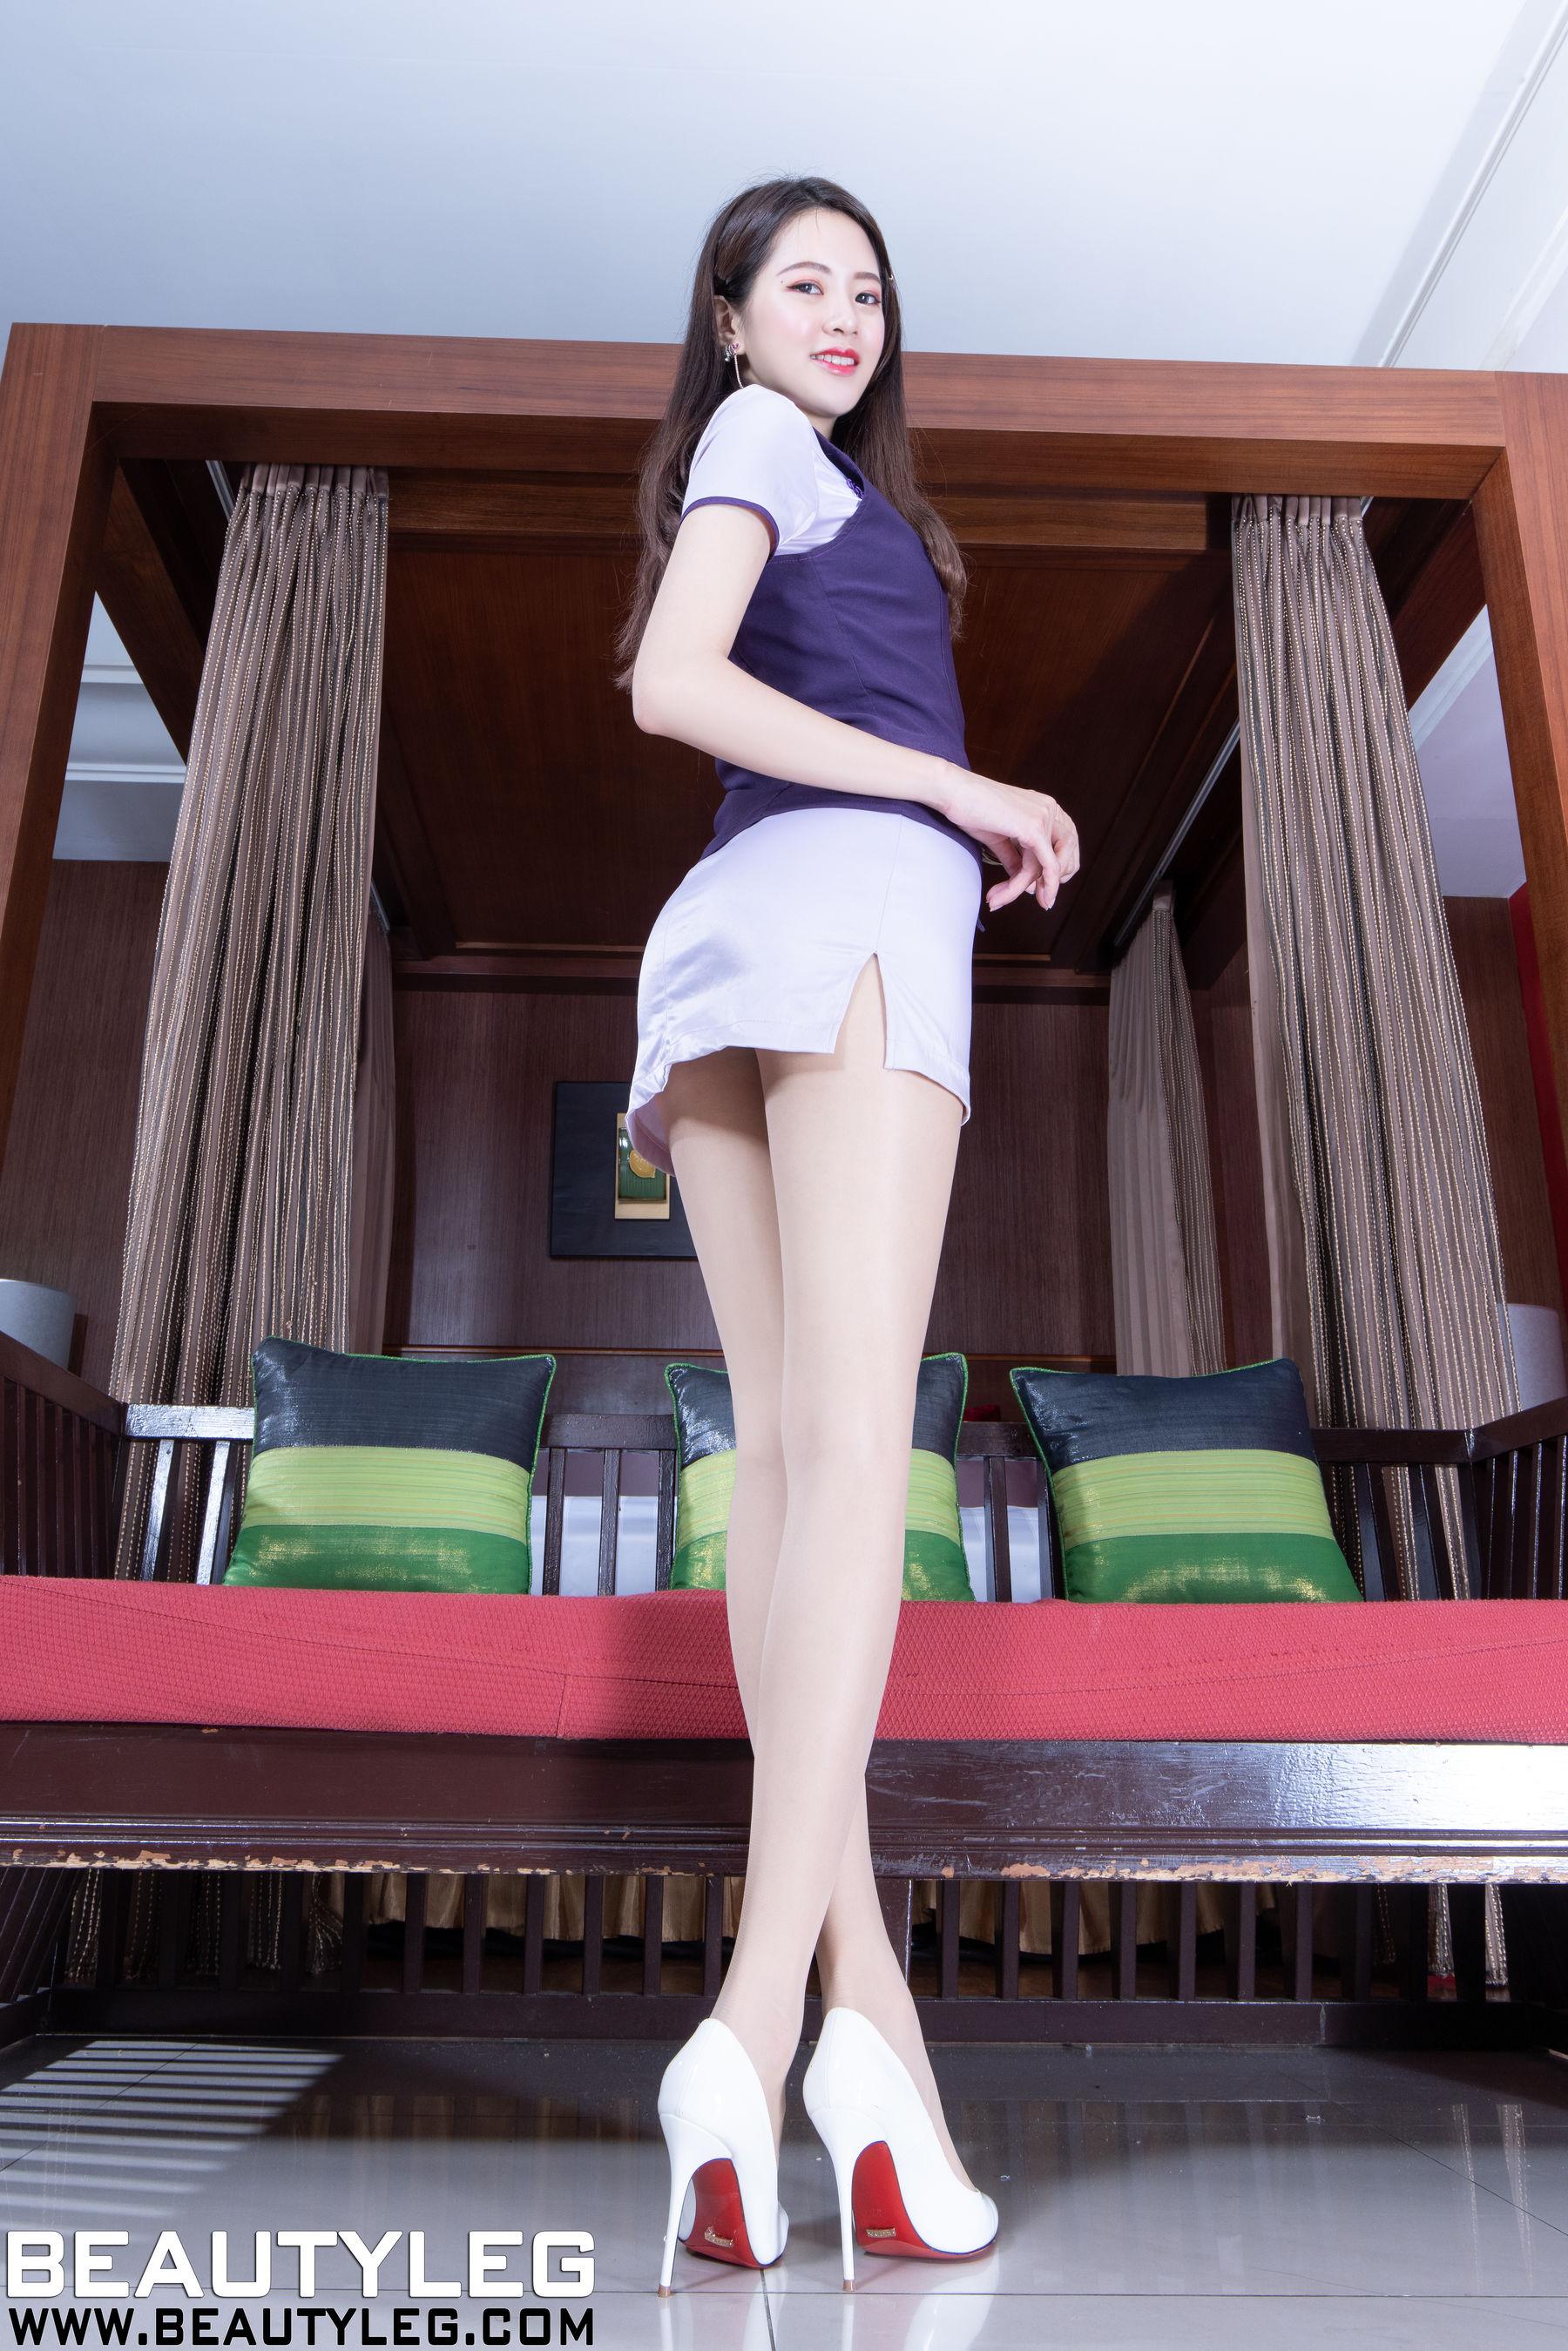 VOL.1512 [Beautyleg]肉丝美腿:腿模Una(Beautyleg Una)超高清个人性感漂亮大图(35P)